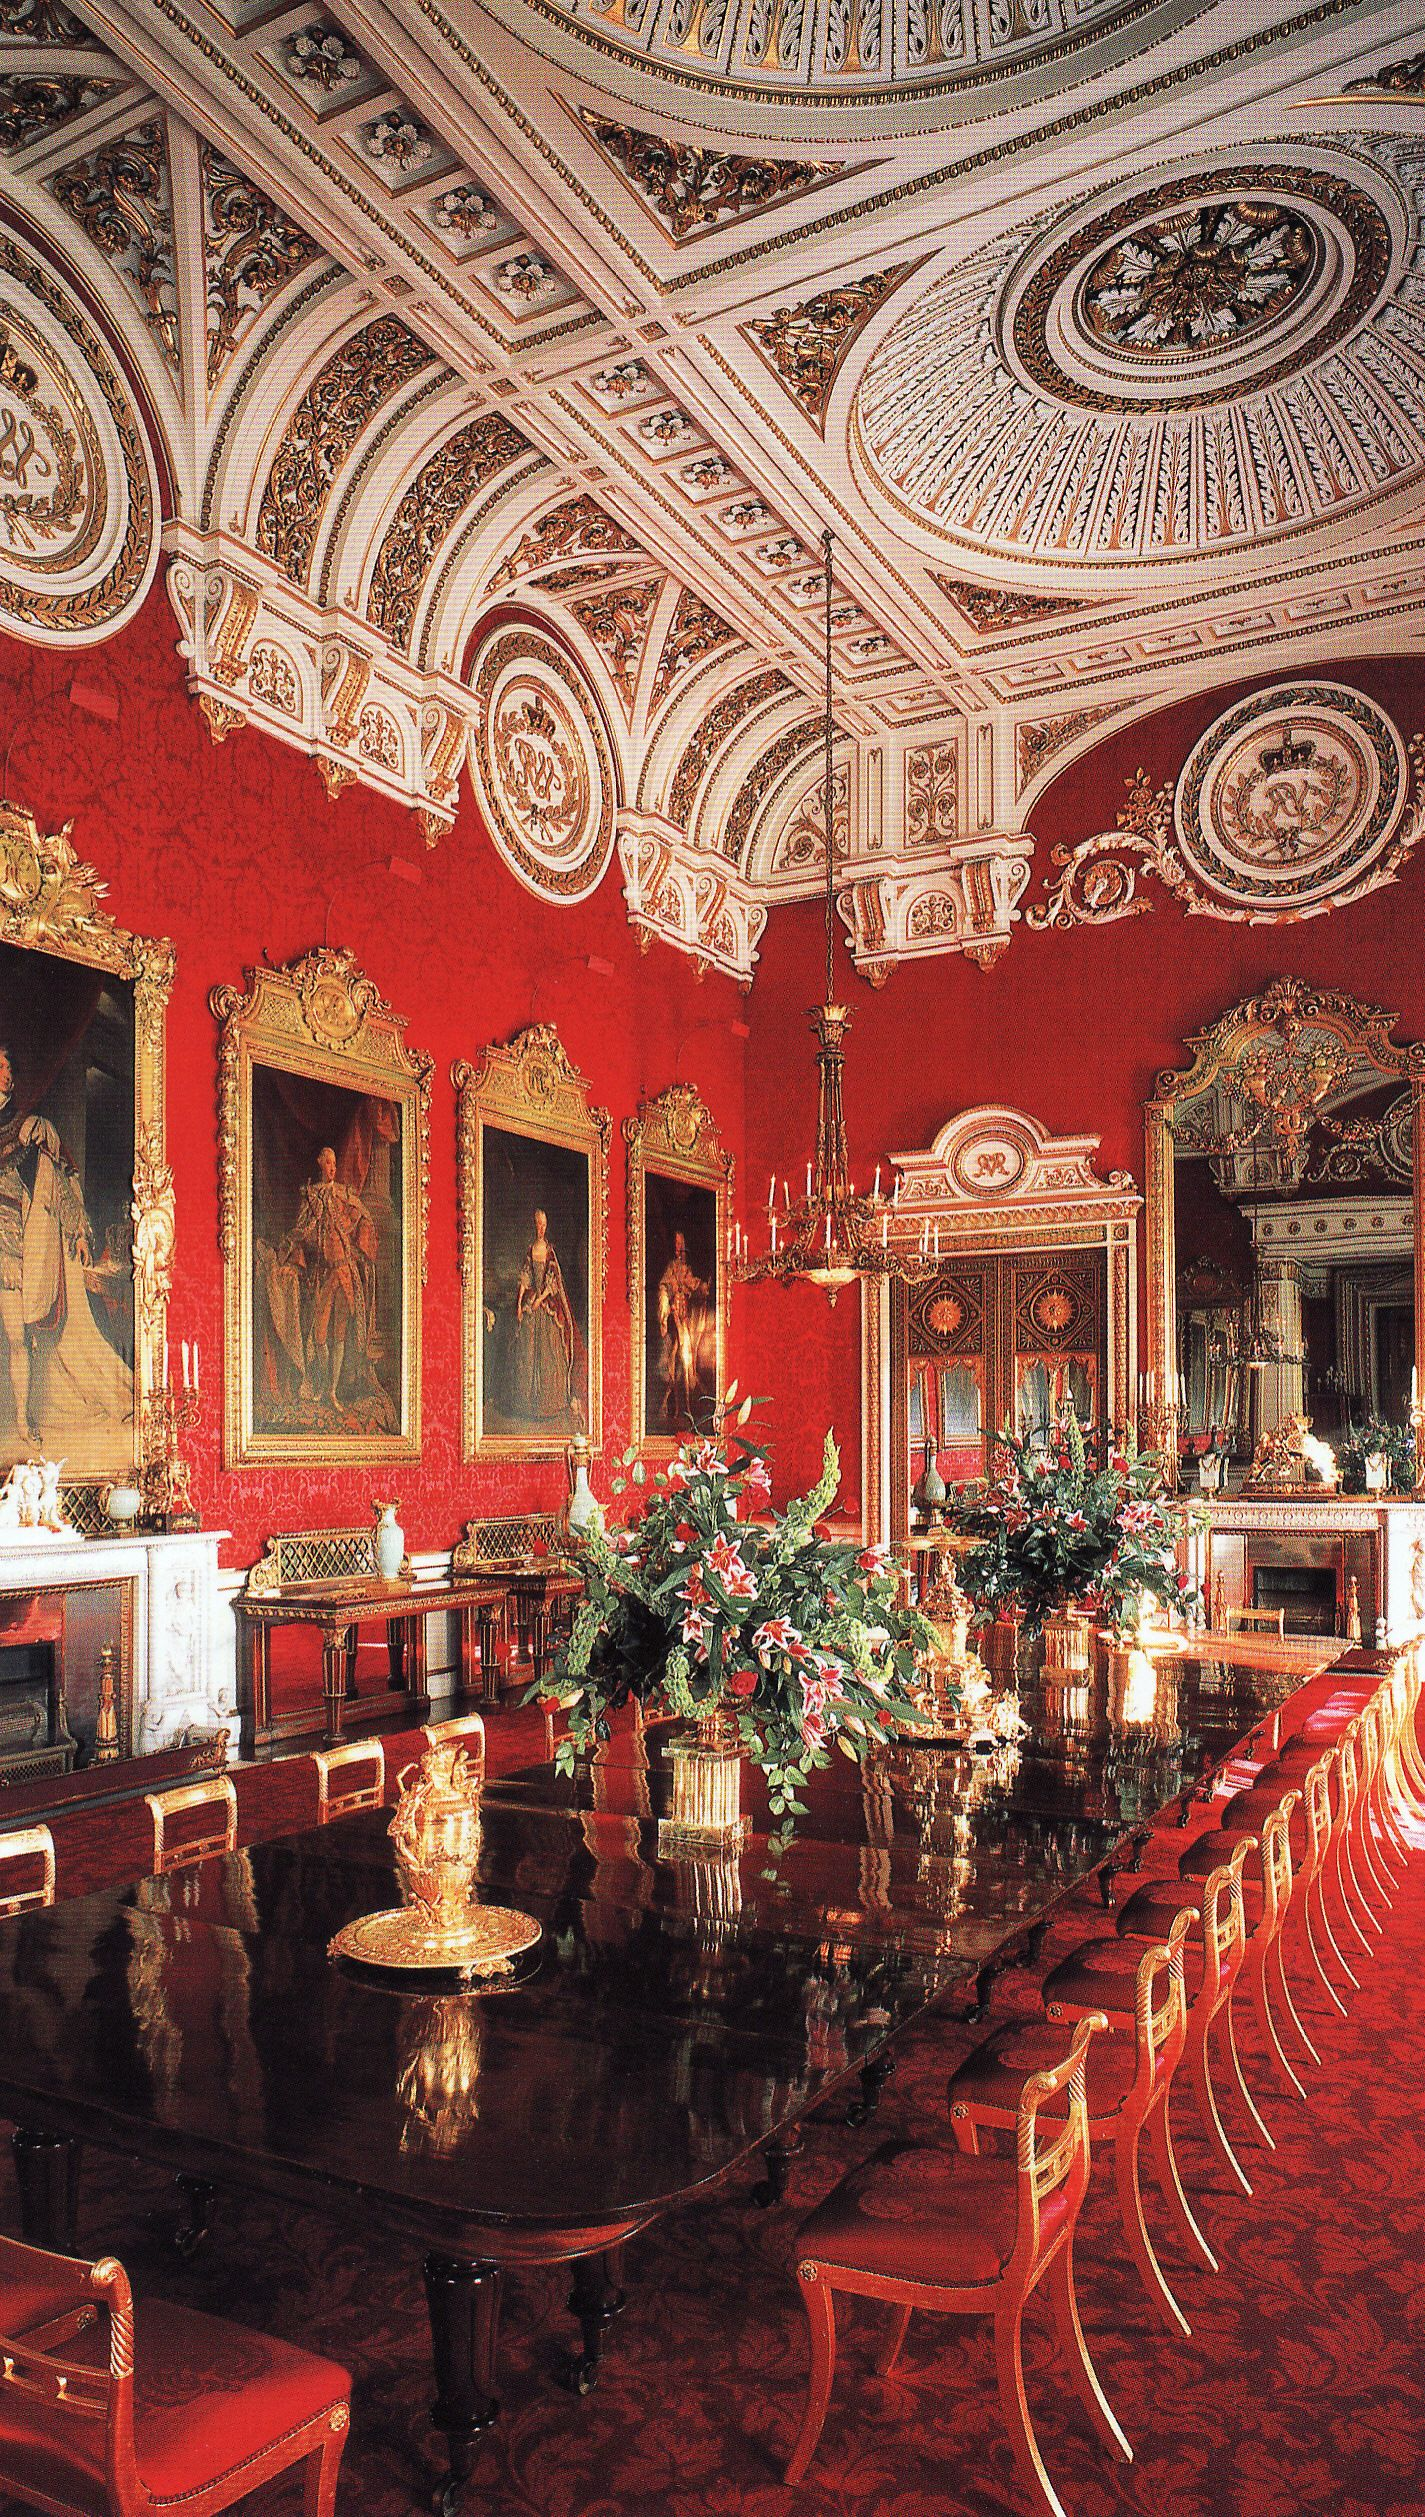 Chinese Dining Room Buckingham